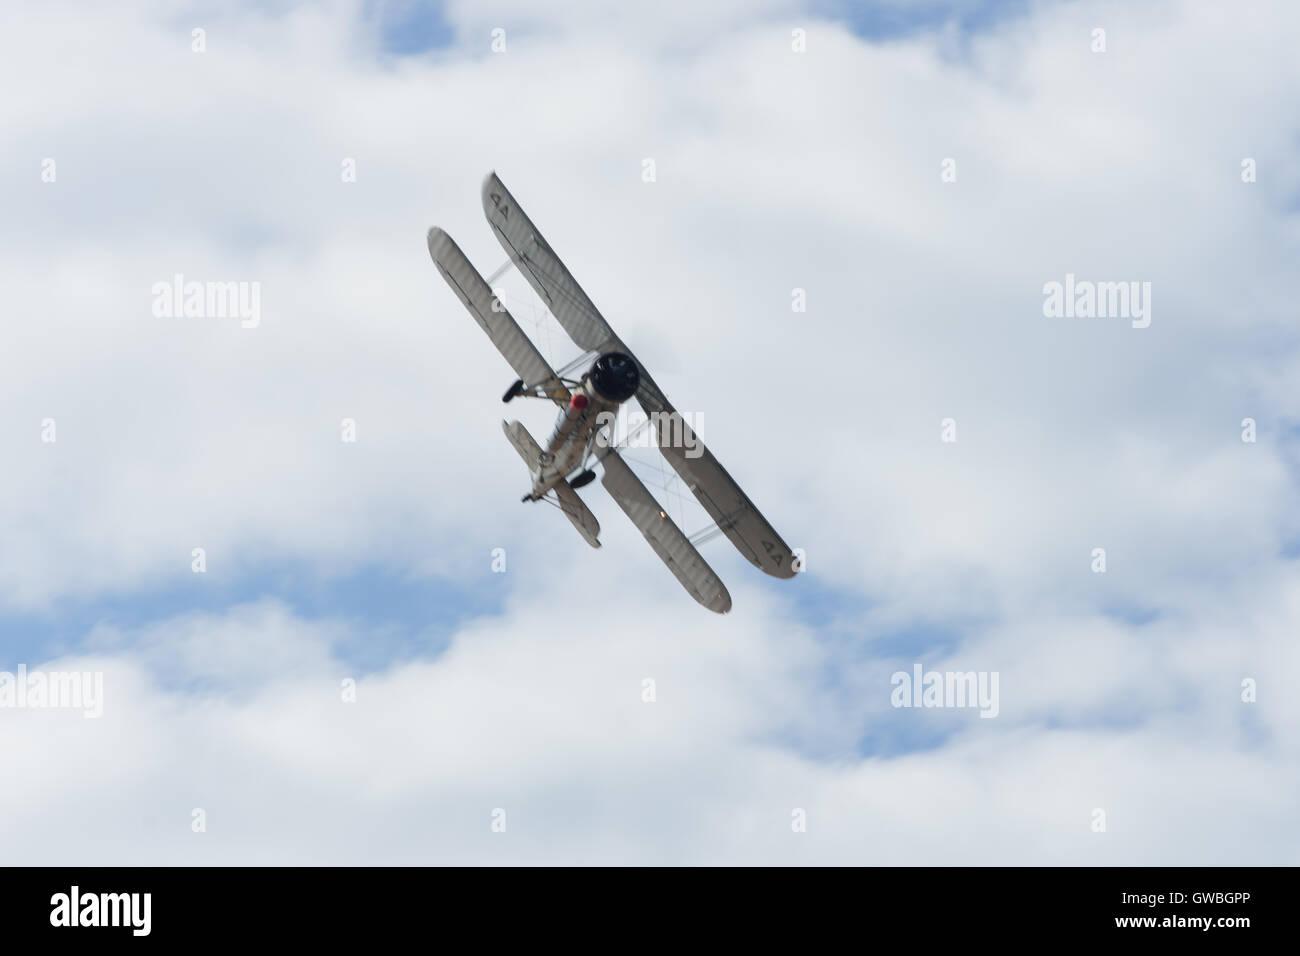 southport airshow fairy swordfish bi-plane plane aircraft Stock Photo